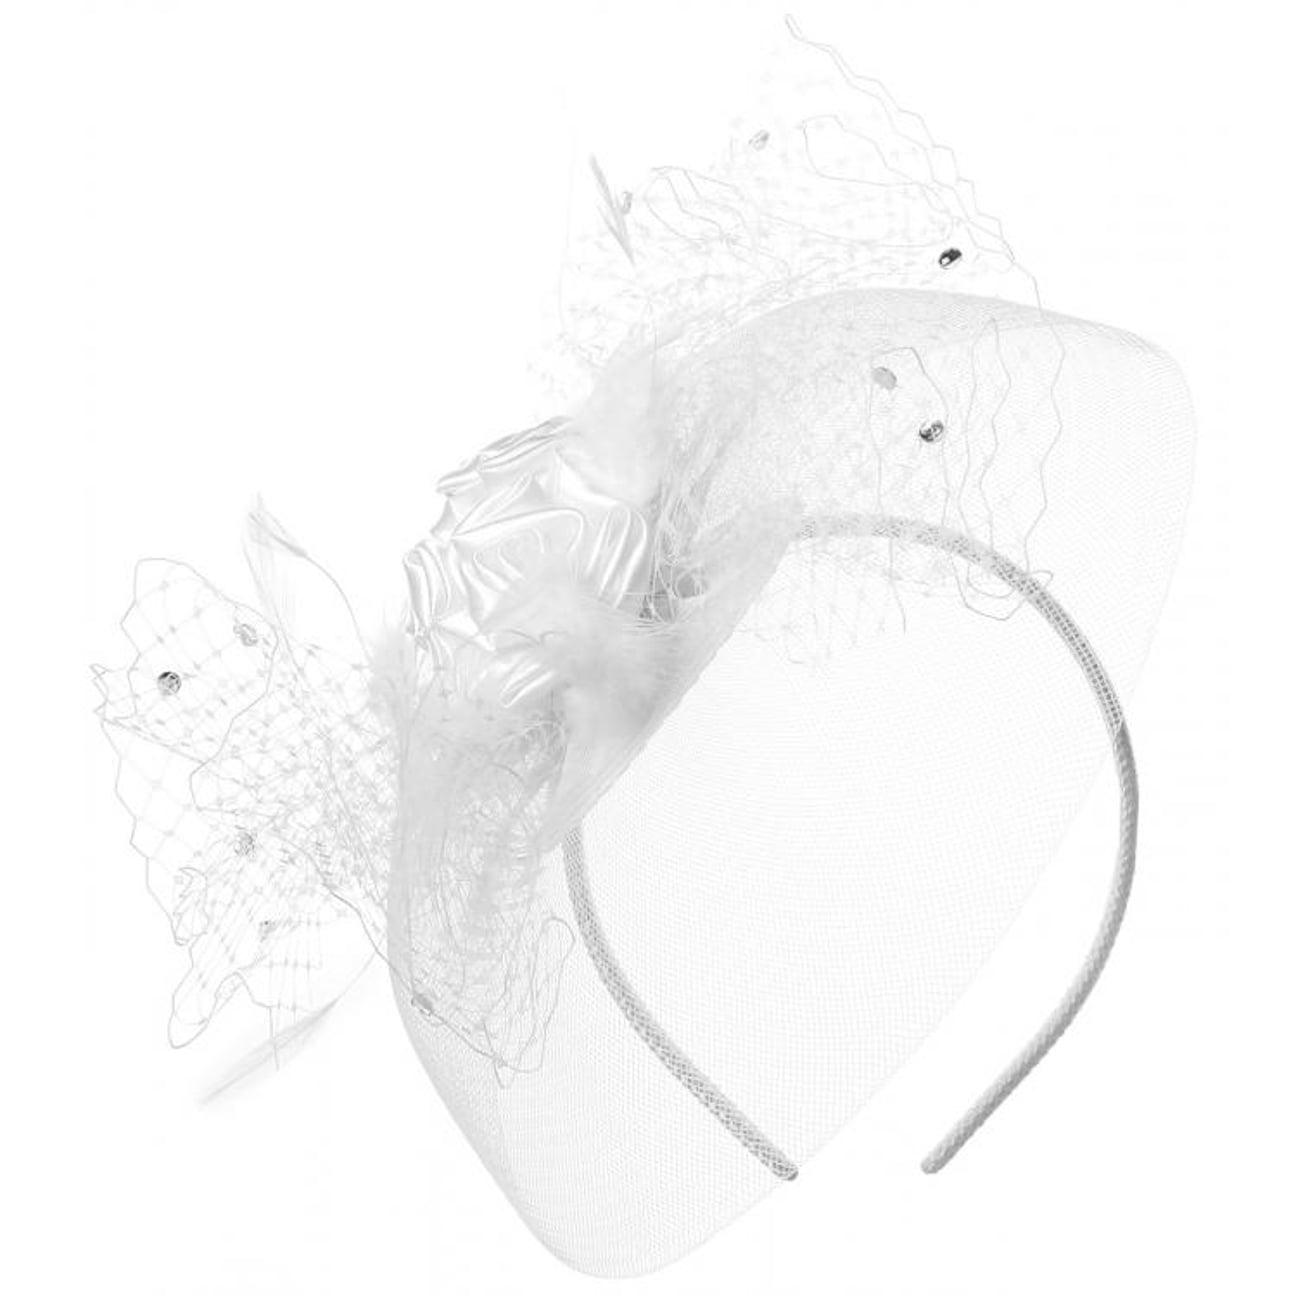 Kokyu Decorazione Capelli by McBURN - bianco crema 1 Kokyu Decorazione ...